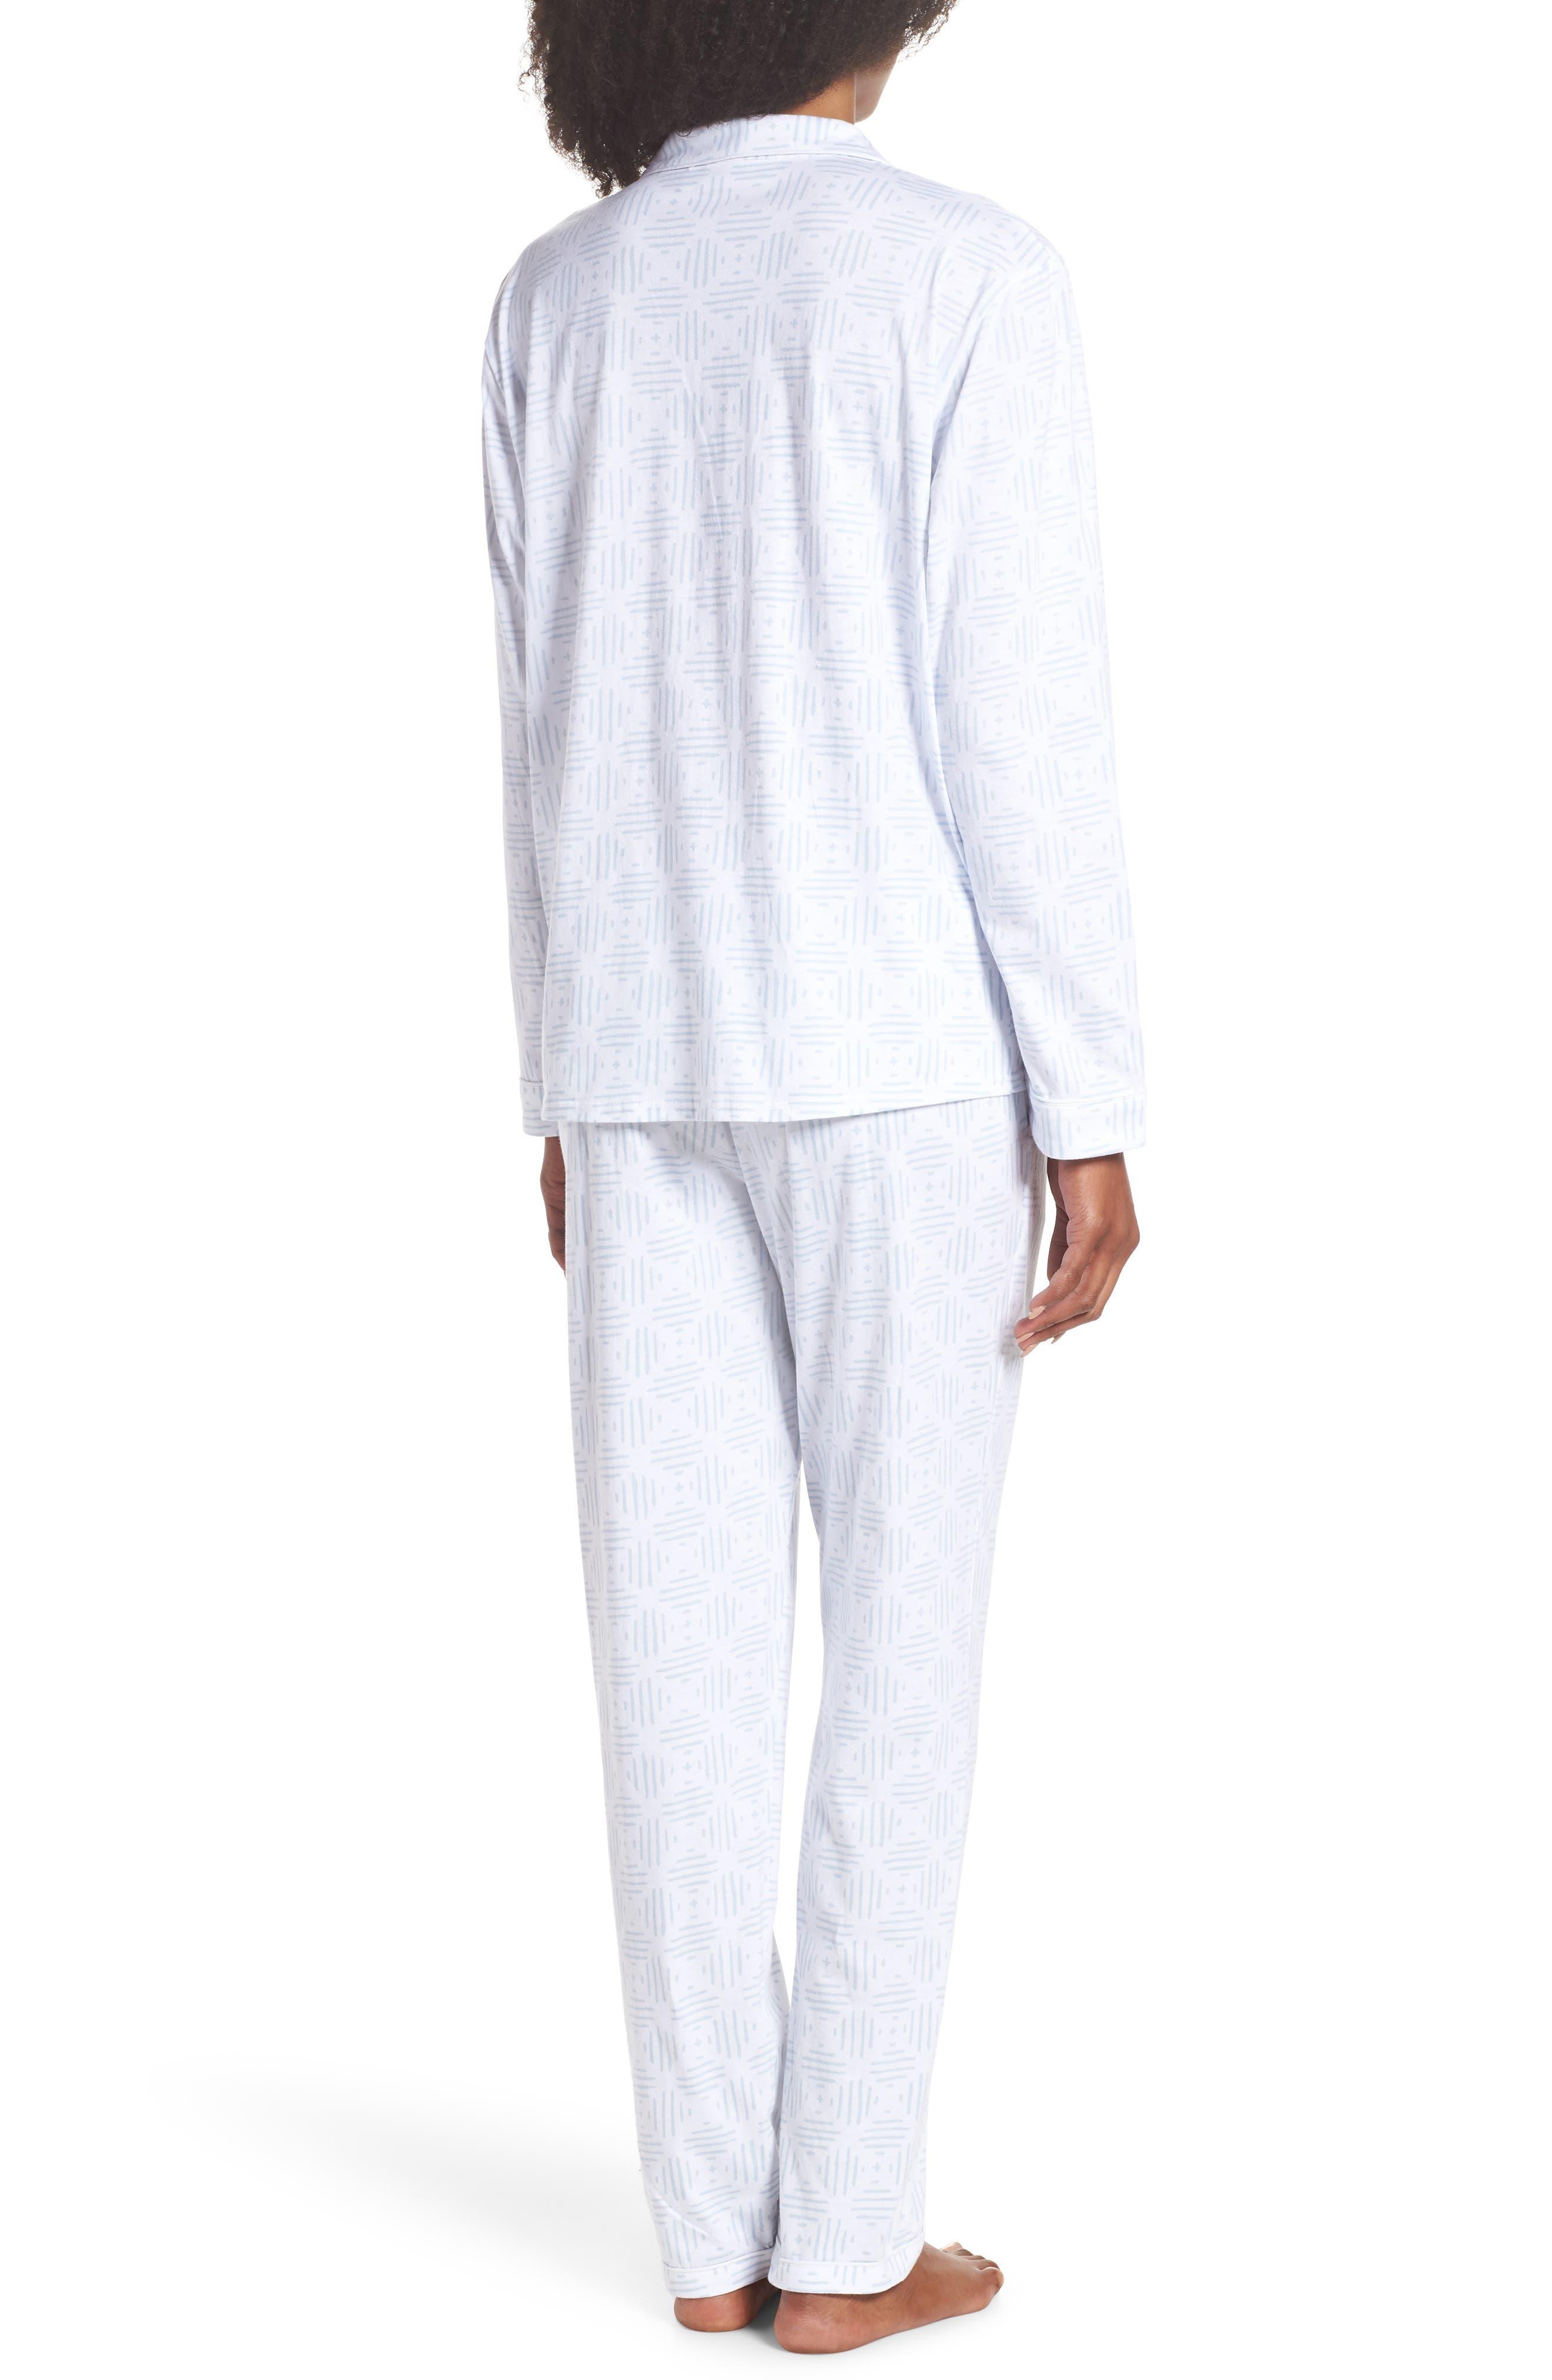 Moroccan Tile Pajamas,                             Alternate thumbnail 2, color,                             Moro Tile Blue